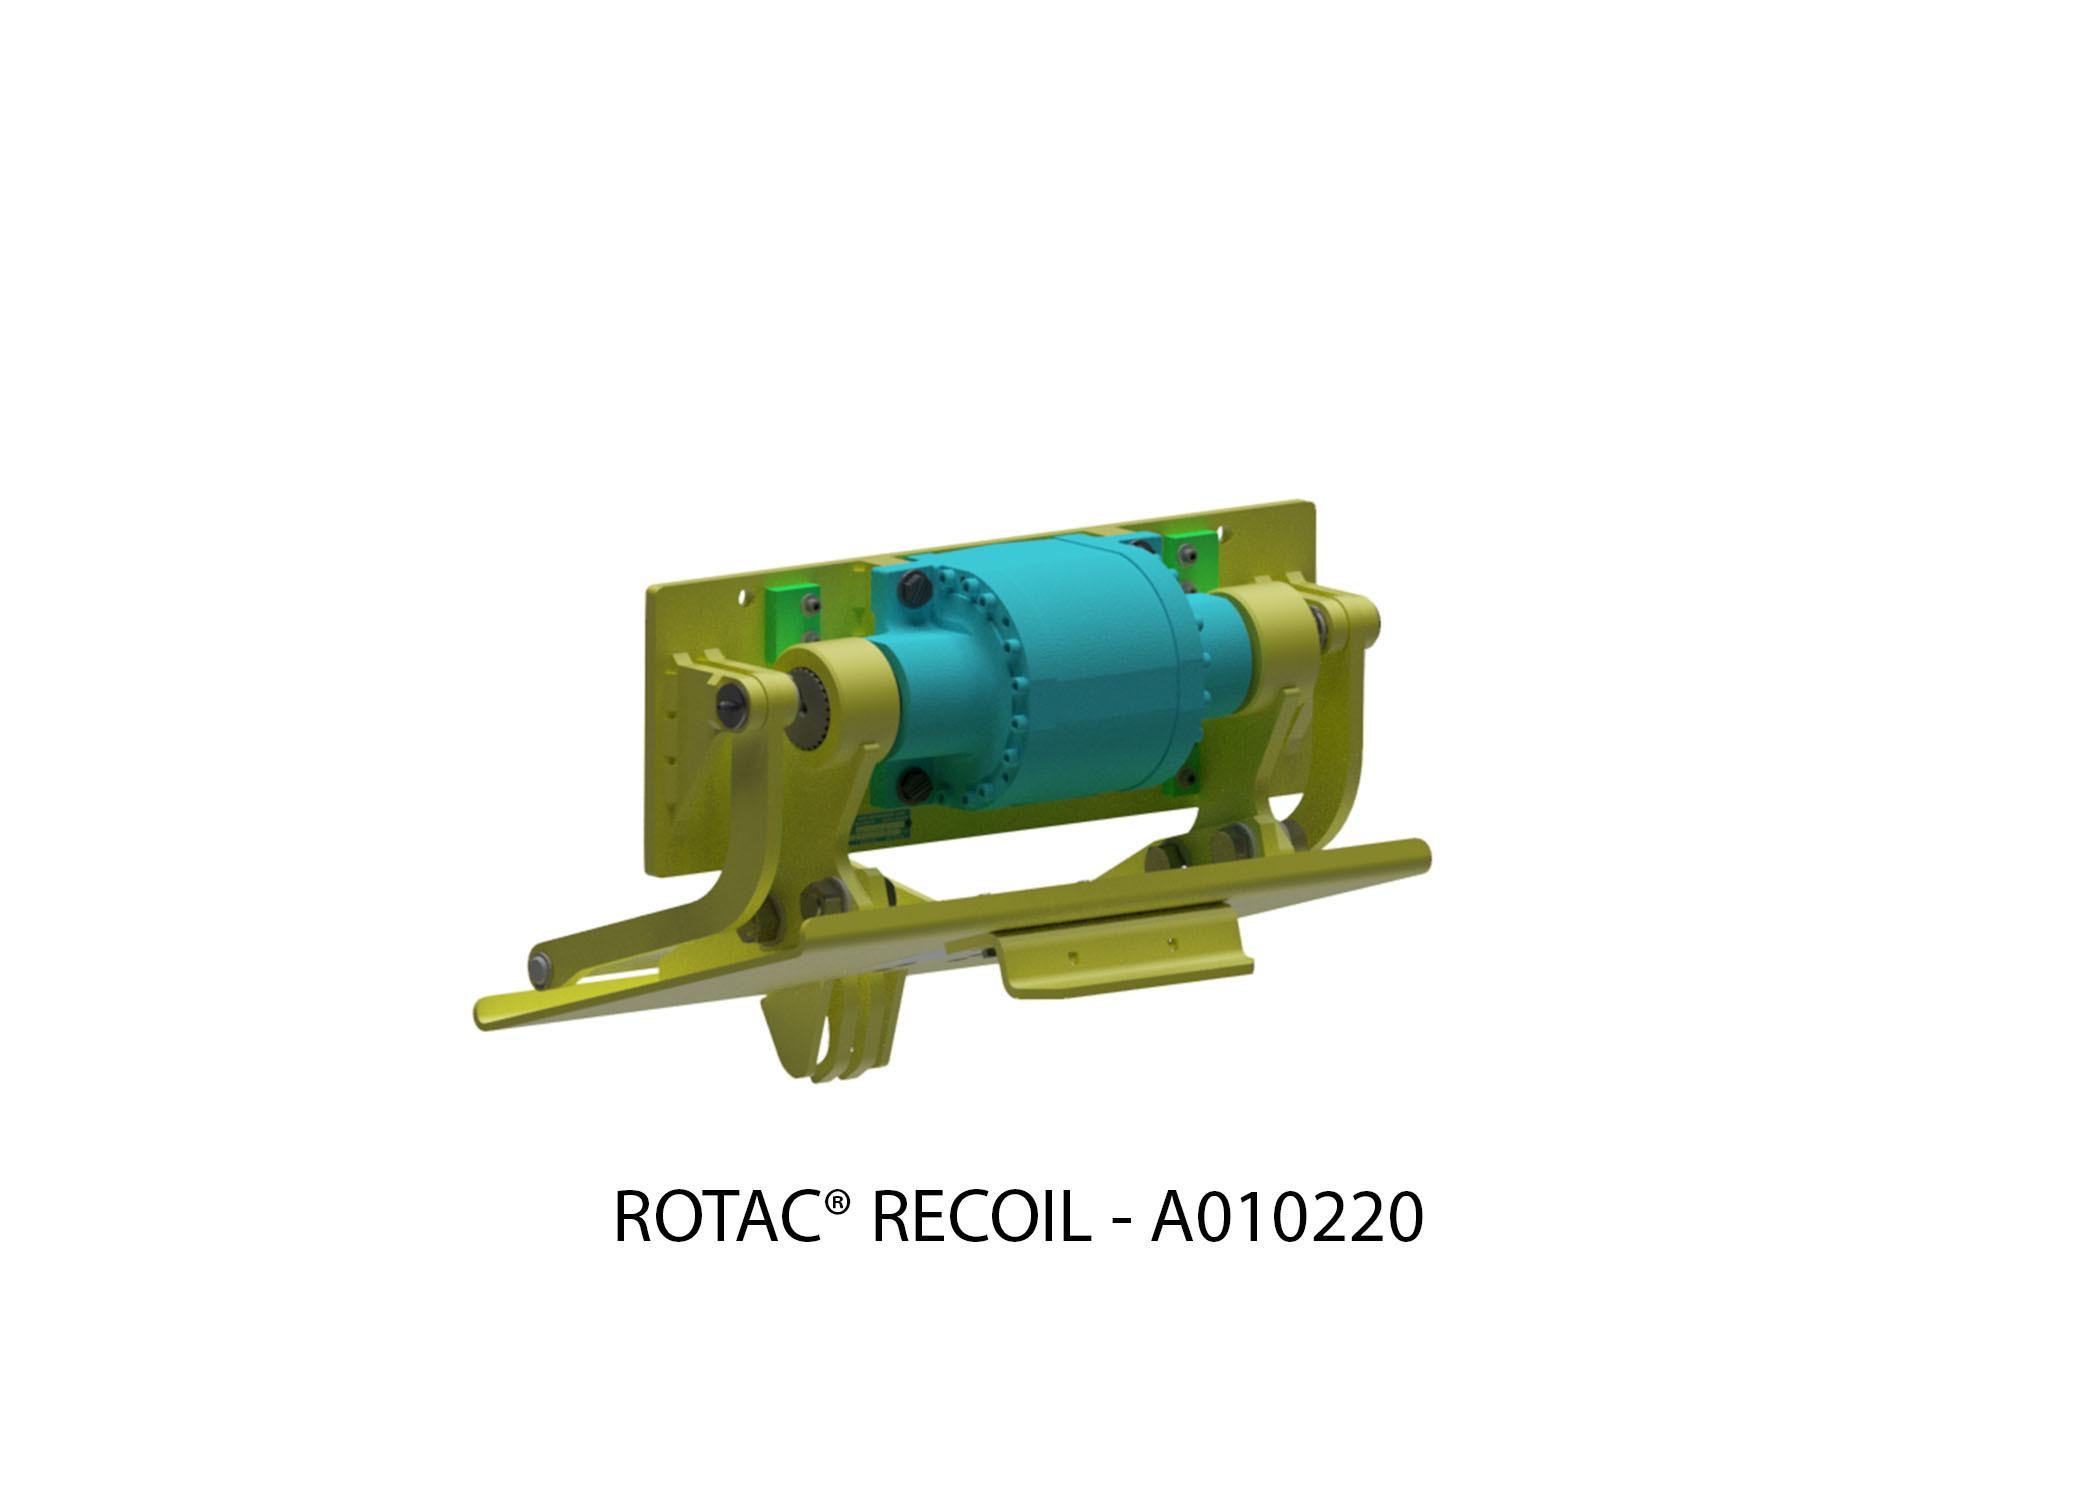 ROTAC RECOIL A010220